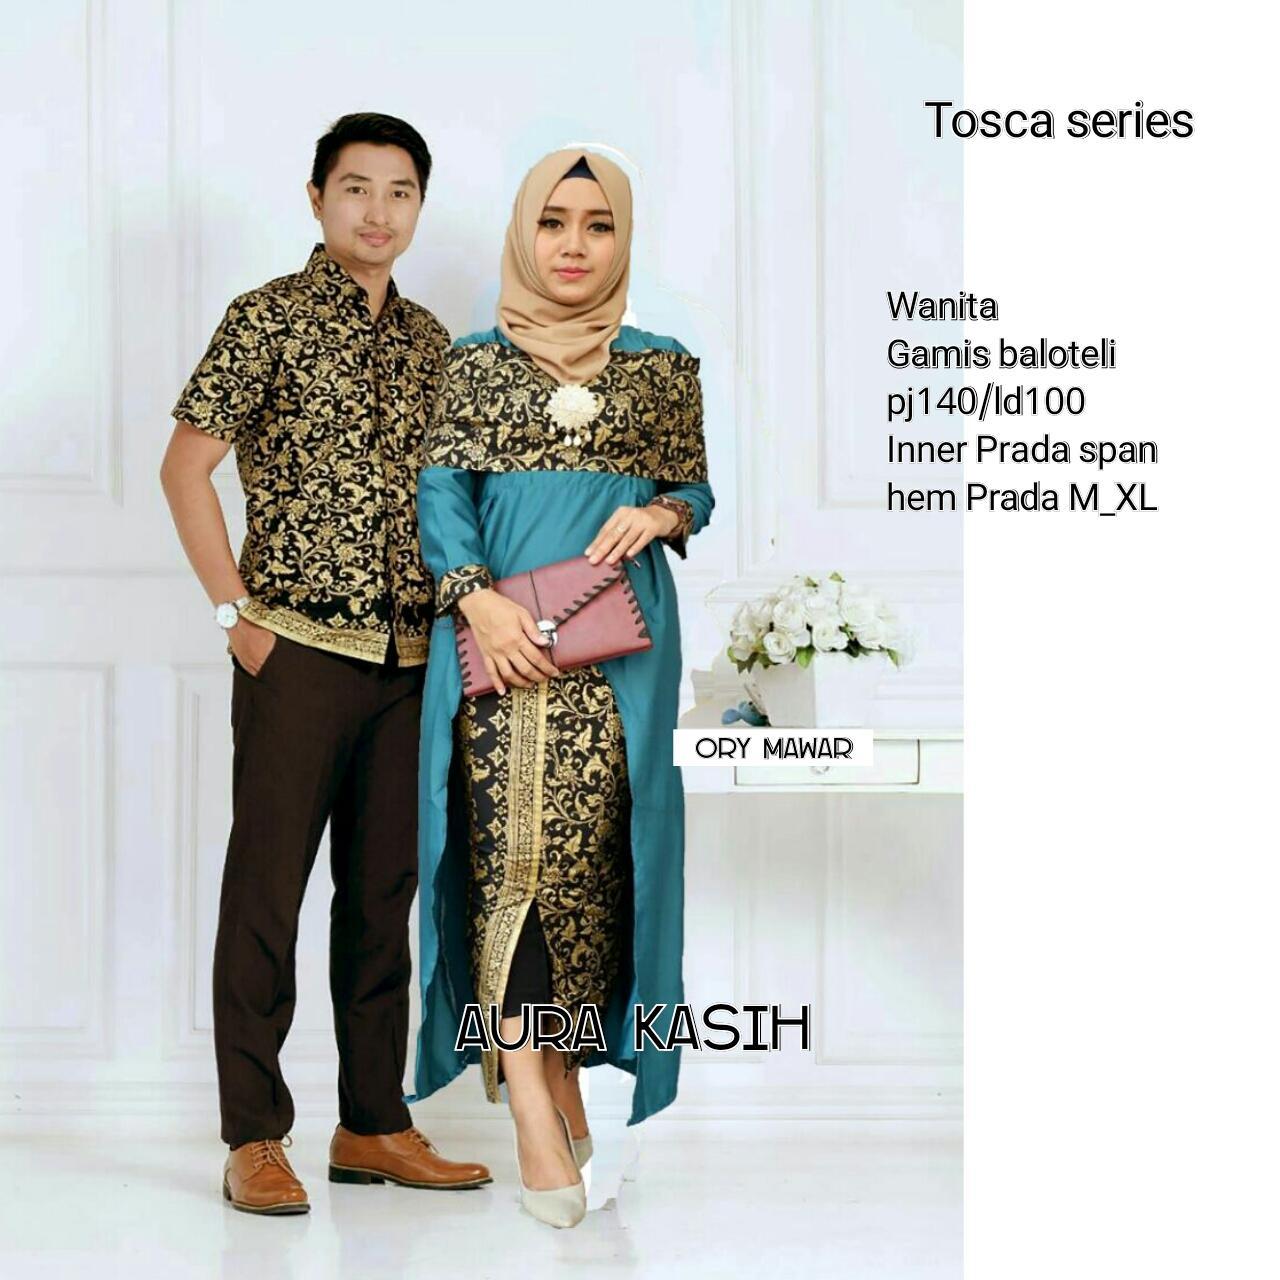 Batik Couple / Batik couple Modern / Baju Batik Couple Sarimbit / Dress / Dress Batik / Batik Gamis / Baju Batik Pria Aura Kasih